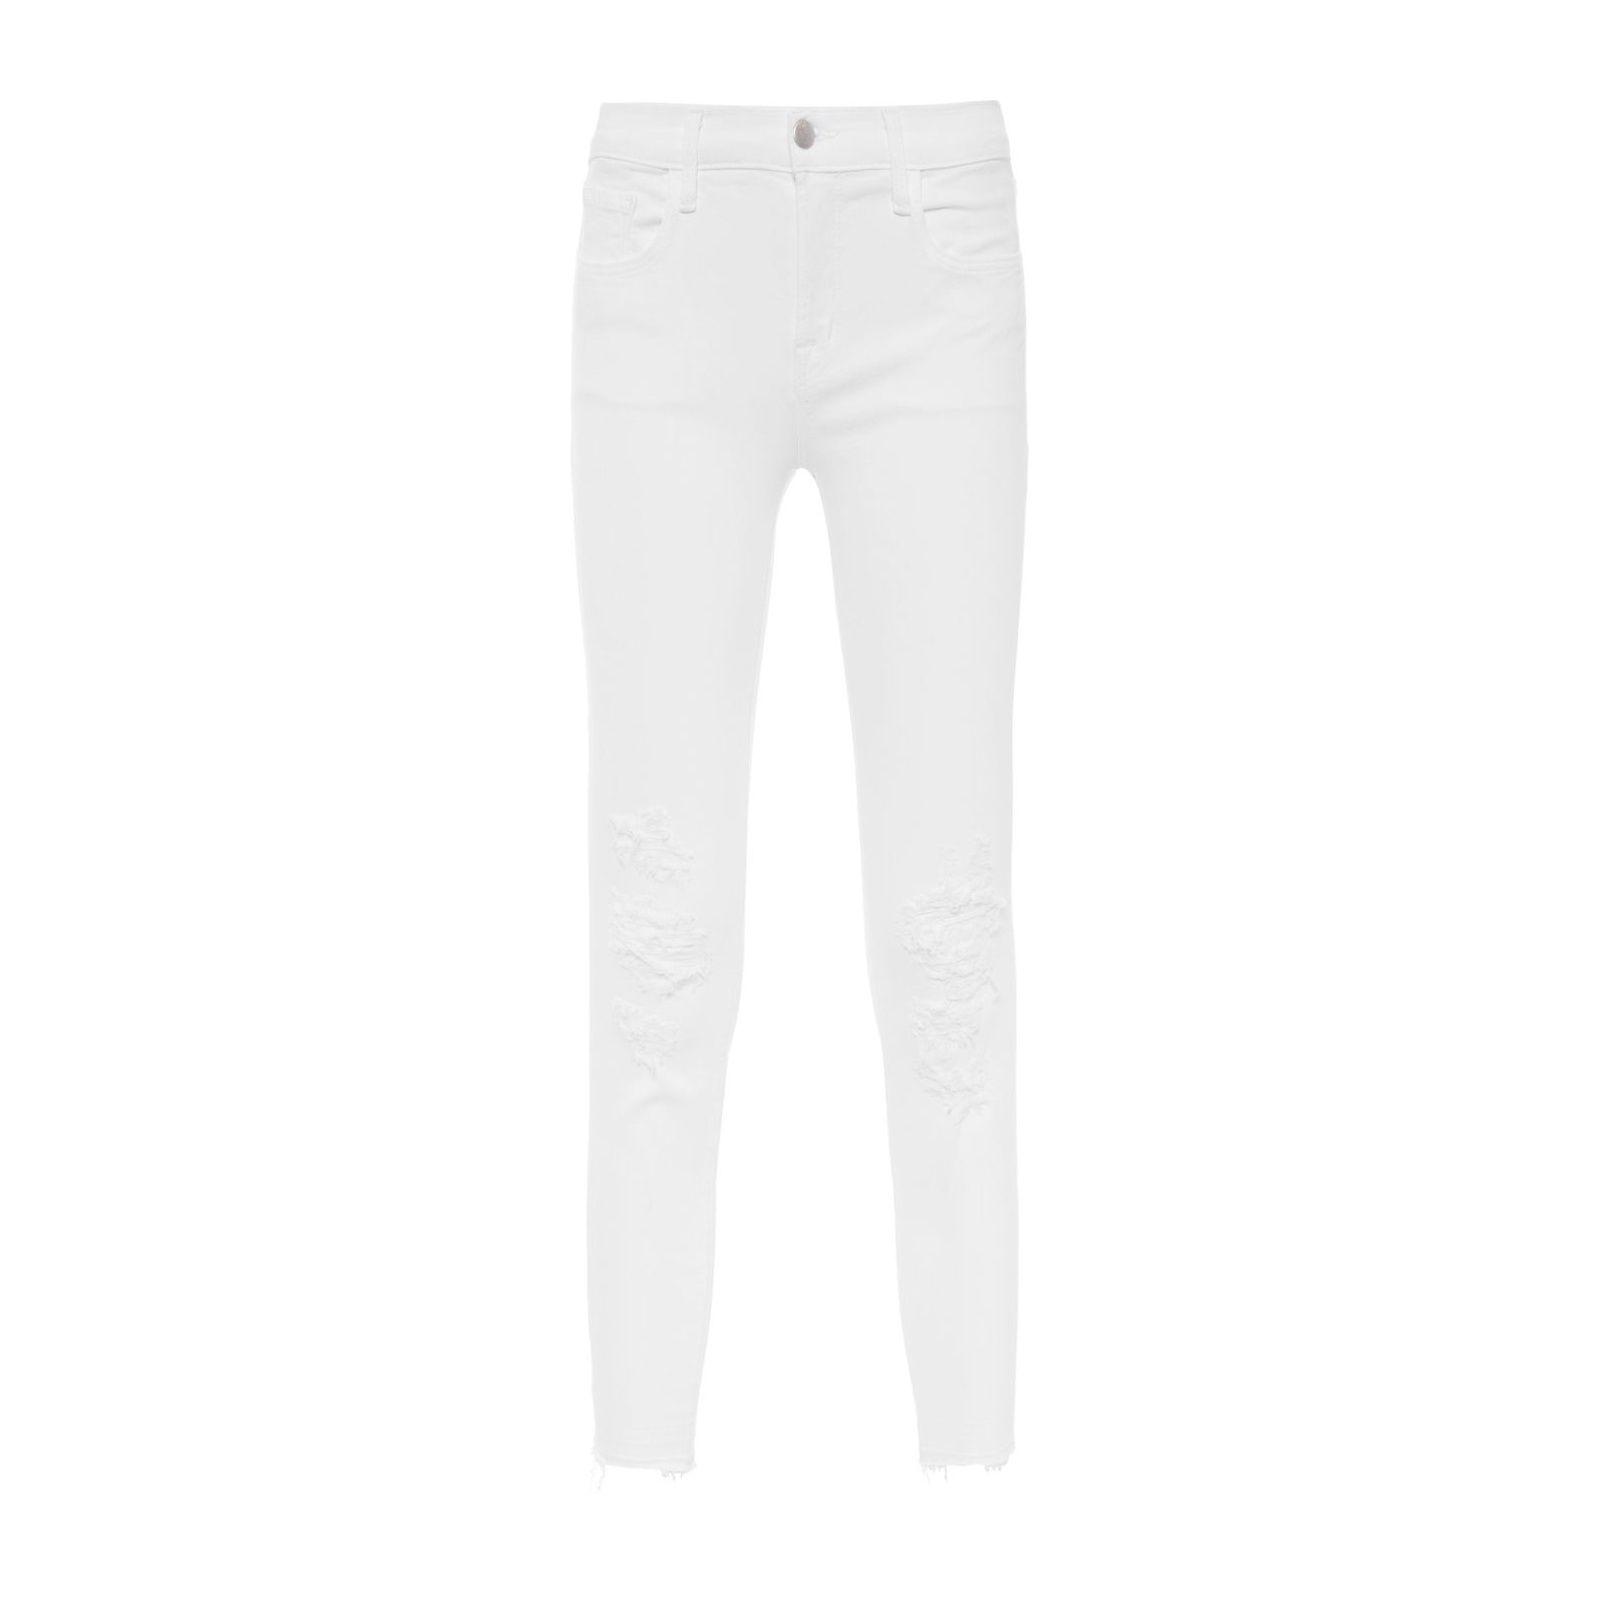 Calça Jeans Low Rise Cropped Skinny - Branco